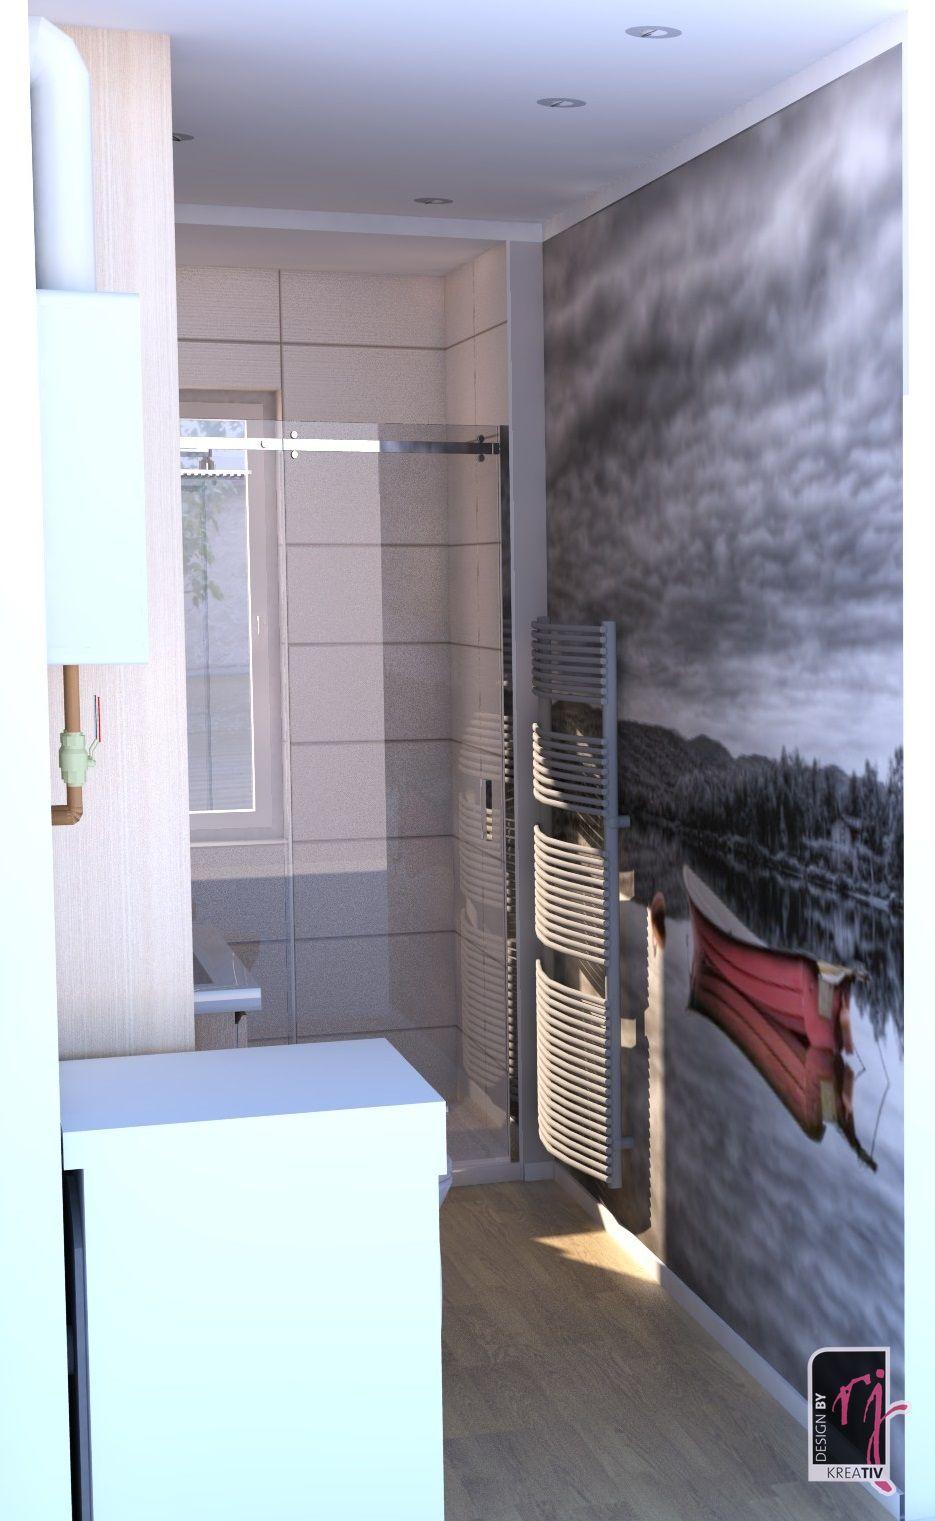 download pflegestufe 1 badezimmer umbau | vitaplaza, Badezimmer ideen